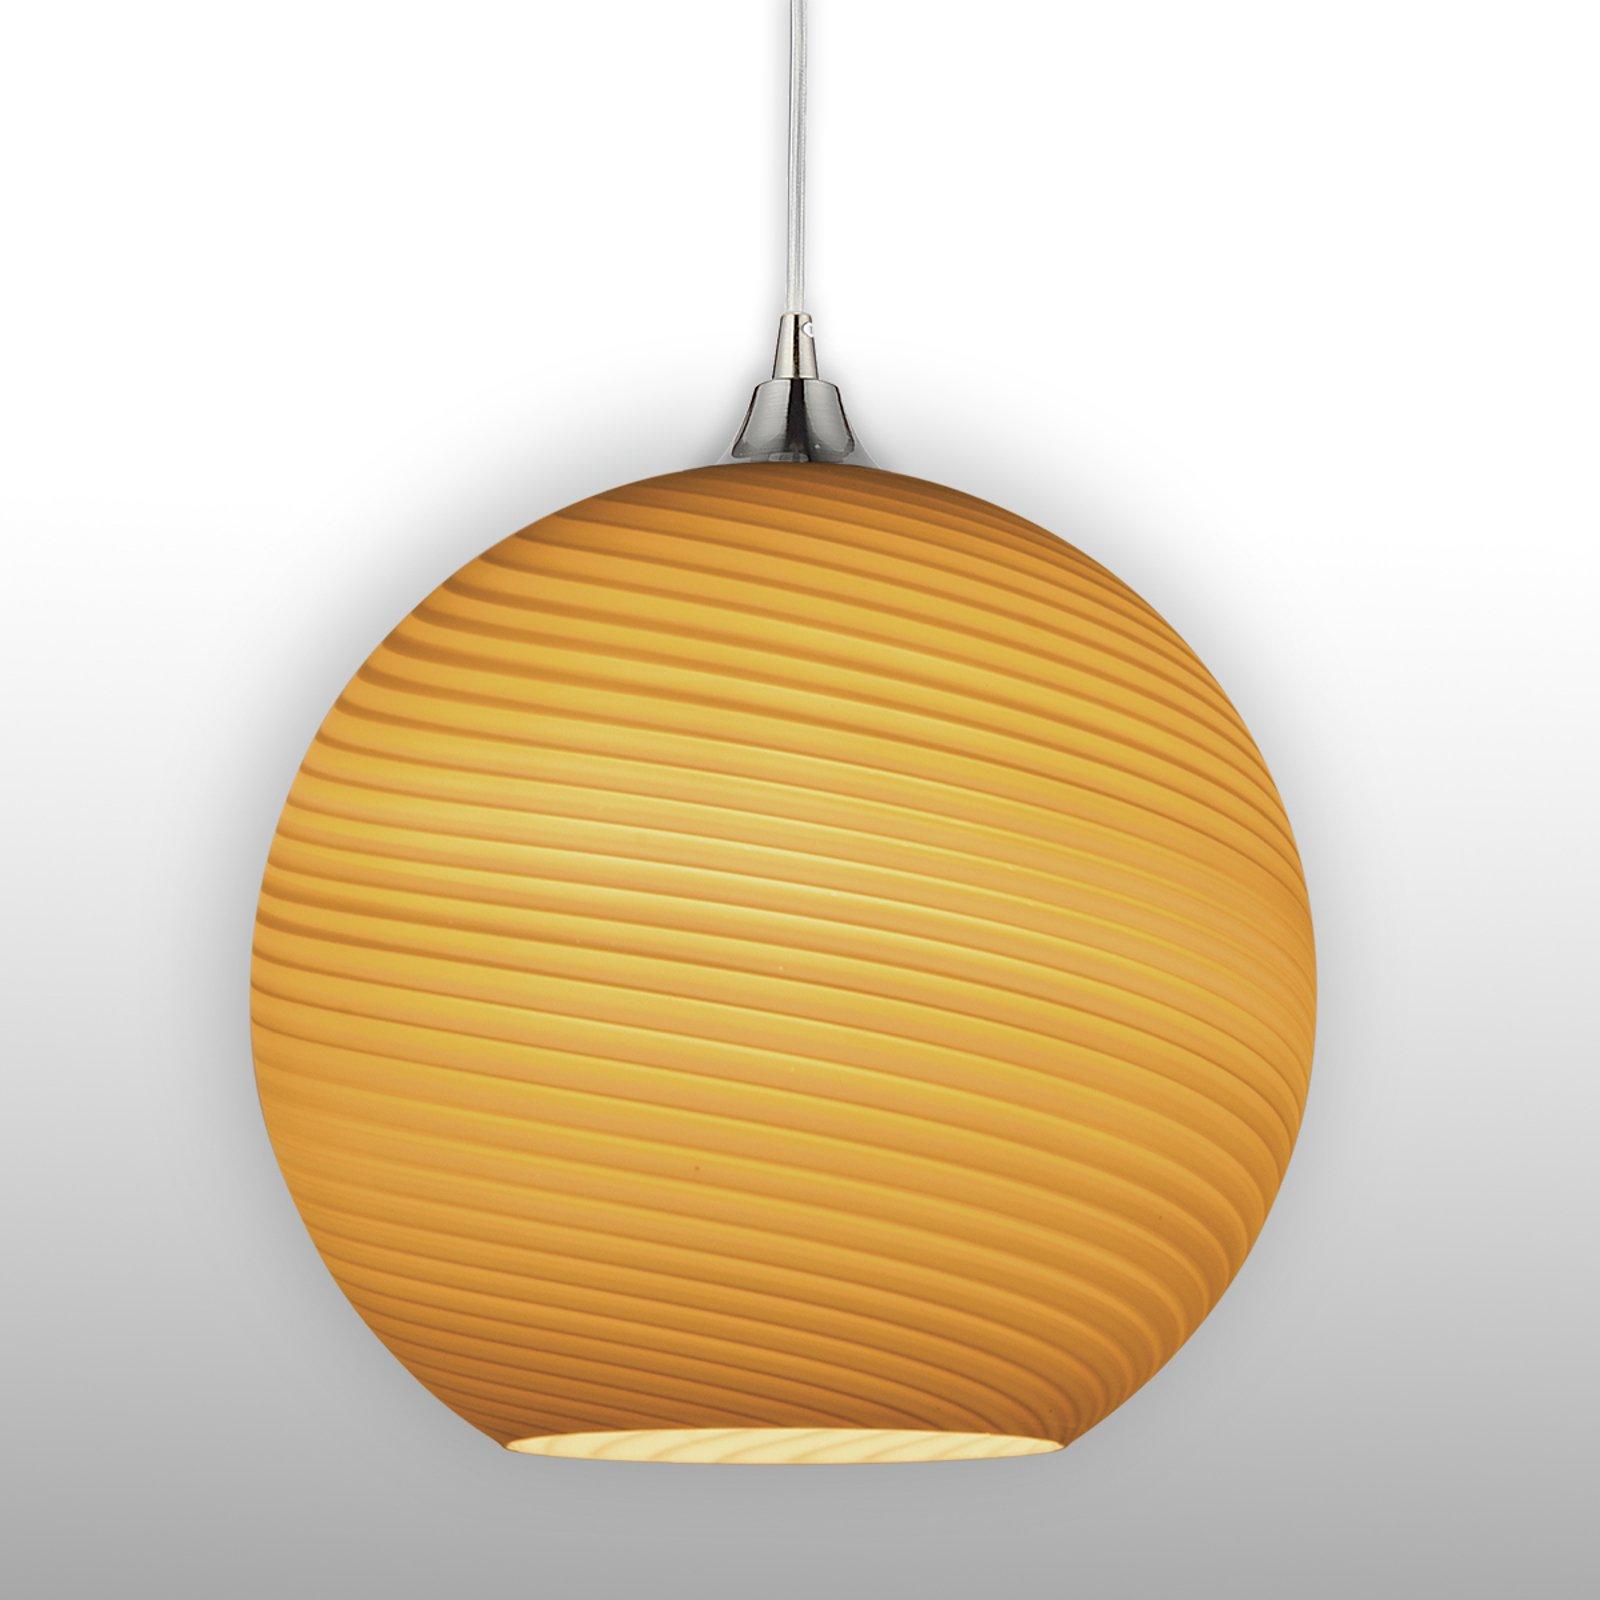 Vidunderlig taklampe Venus - 30 cm